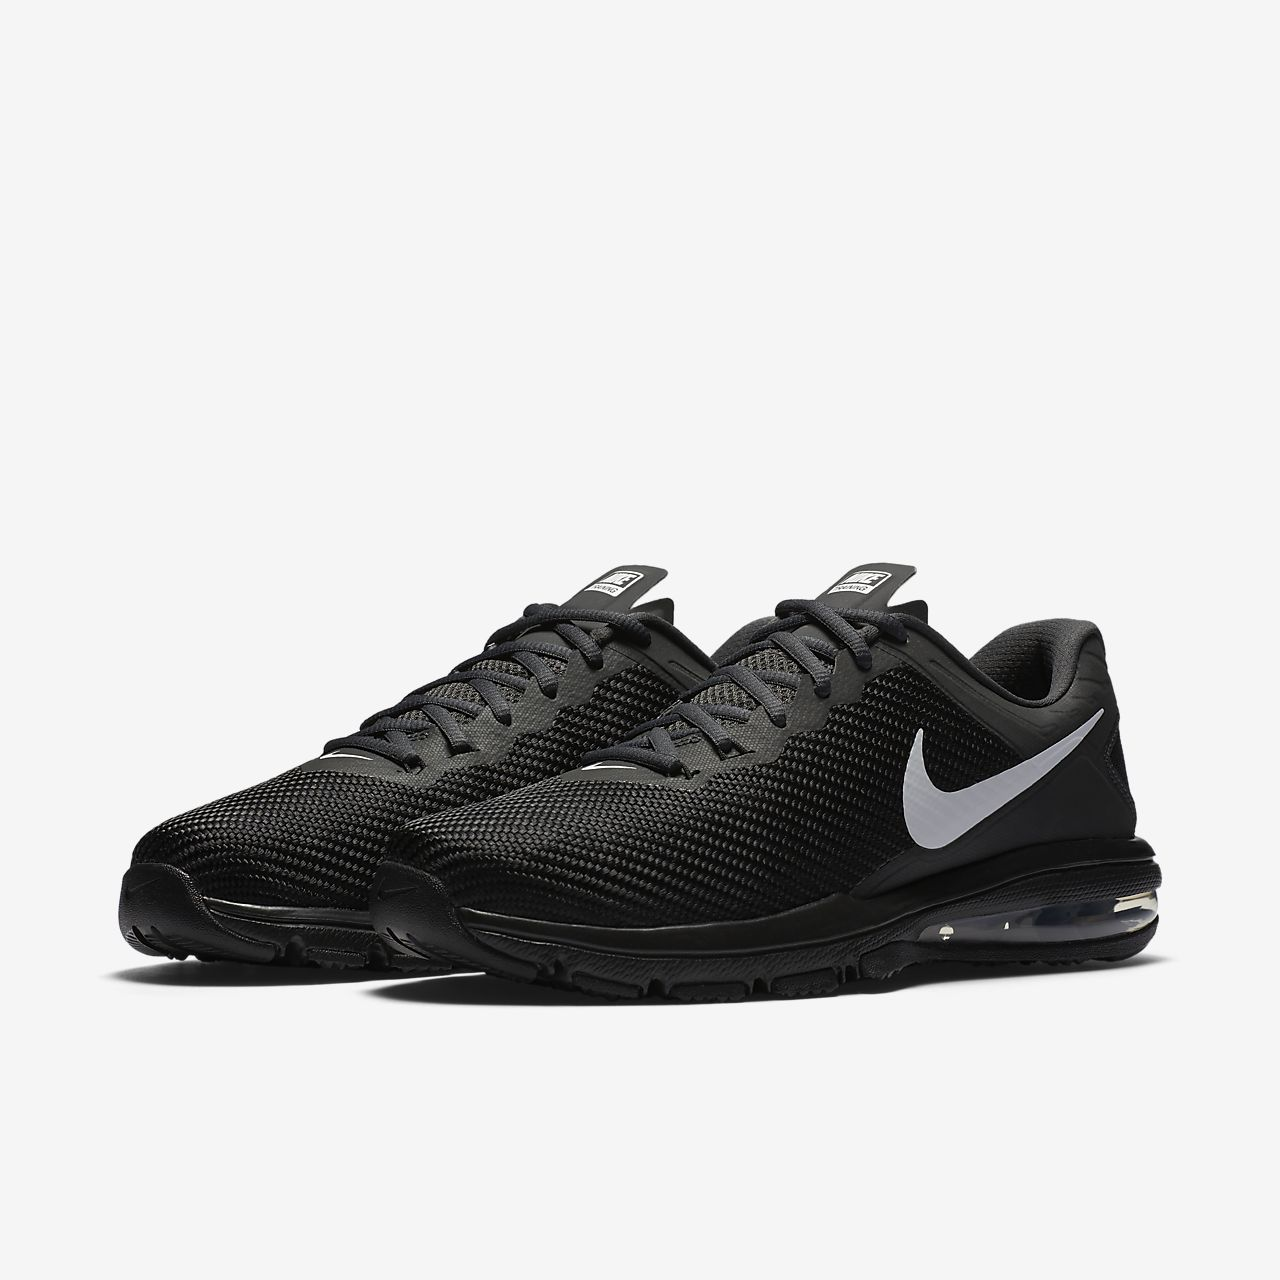 sports shoes 2bcd4 b56d5 ... Nike Air Max Full Ride TR 1.5 Zapatillas de entrenamiento - Hombre